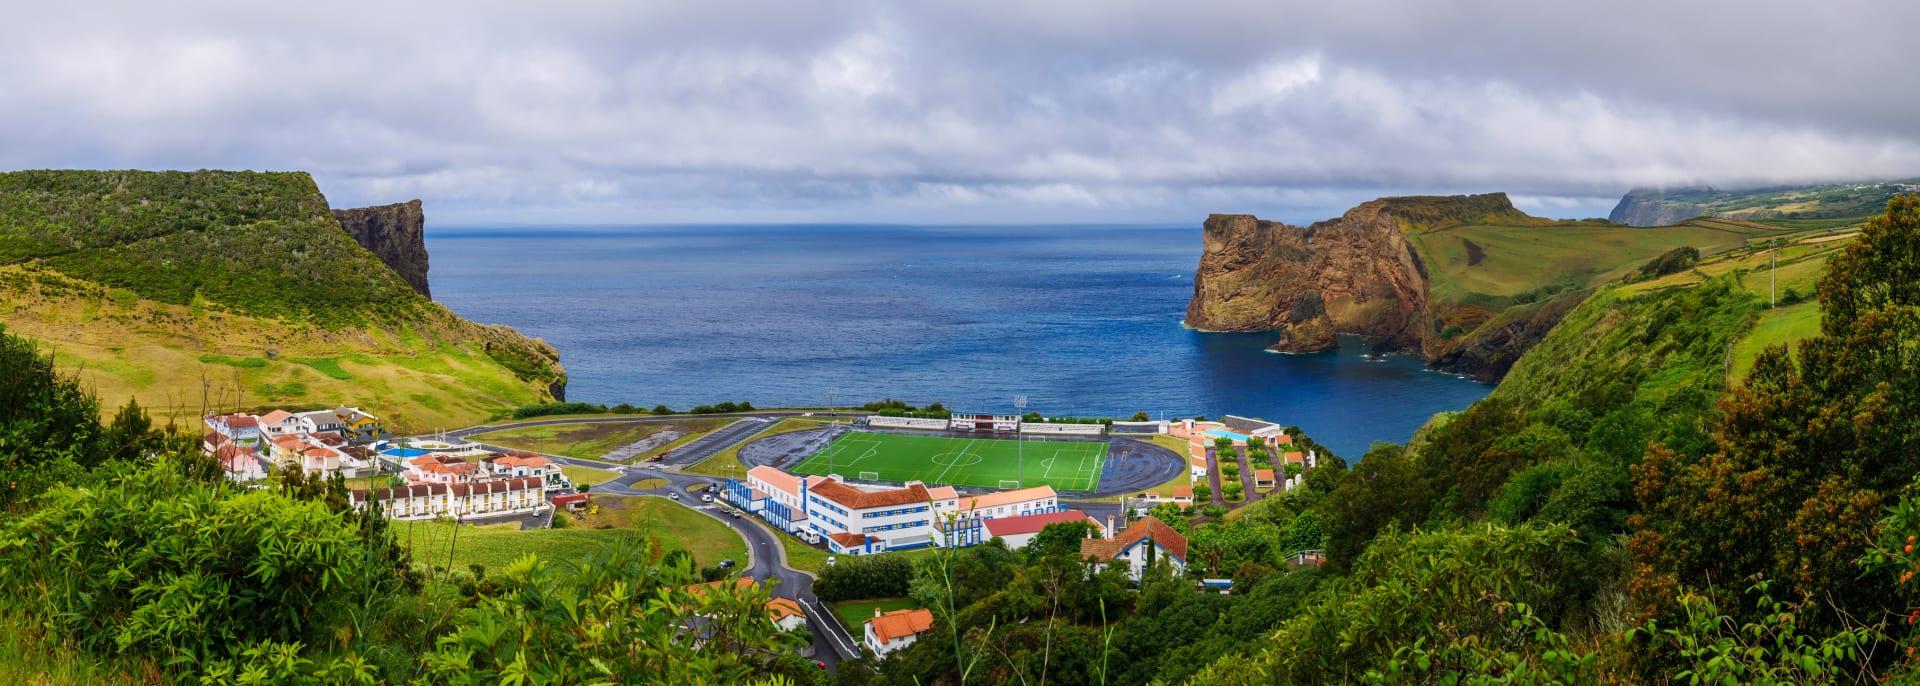 Portugal, Fussball-Camp, Fussball-Trainingslagerreisen, Knecht Reisen